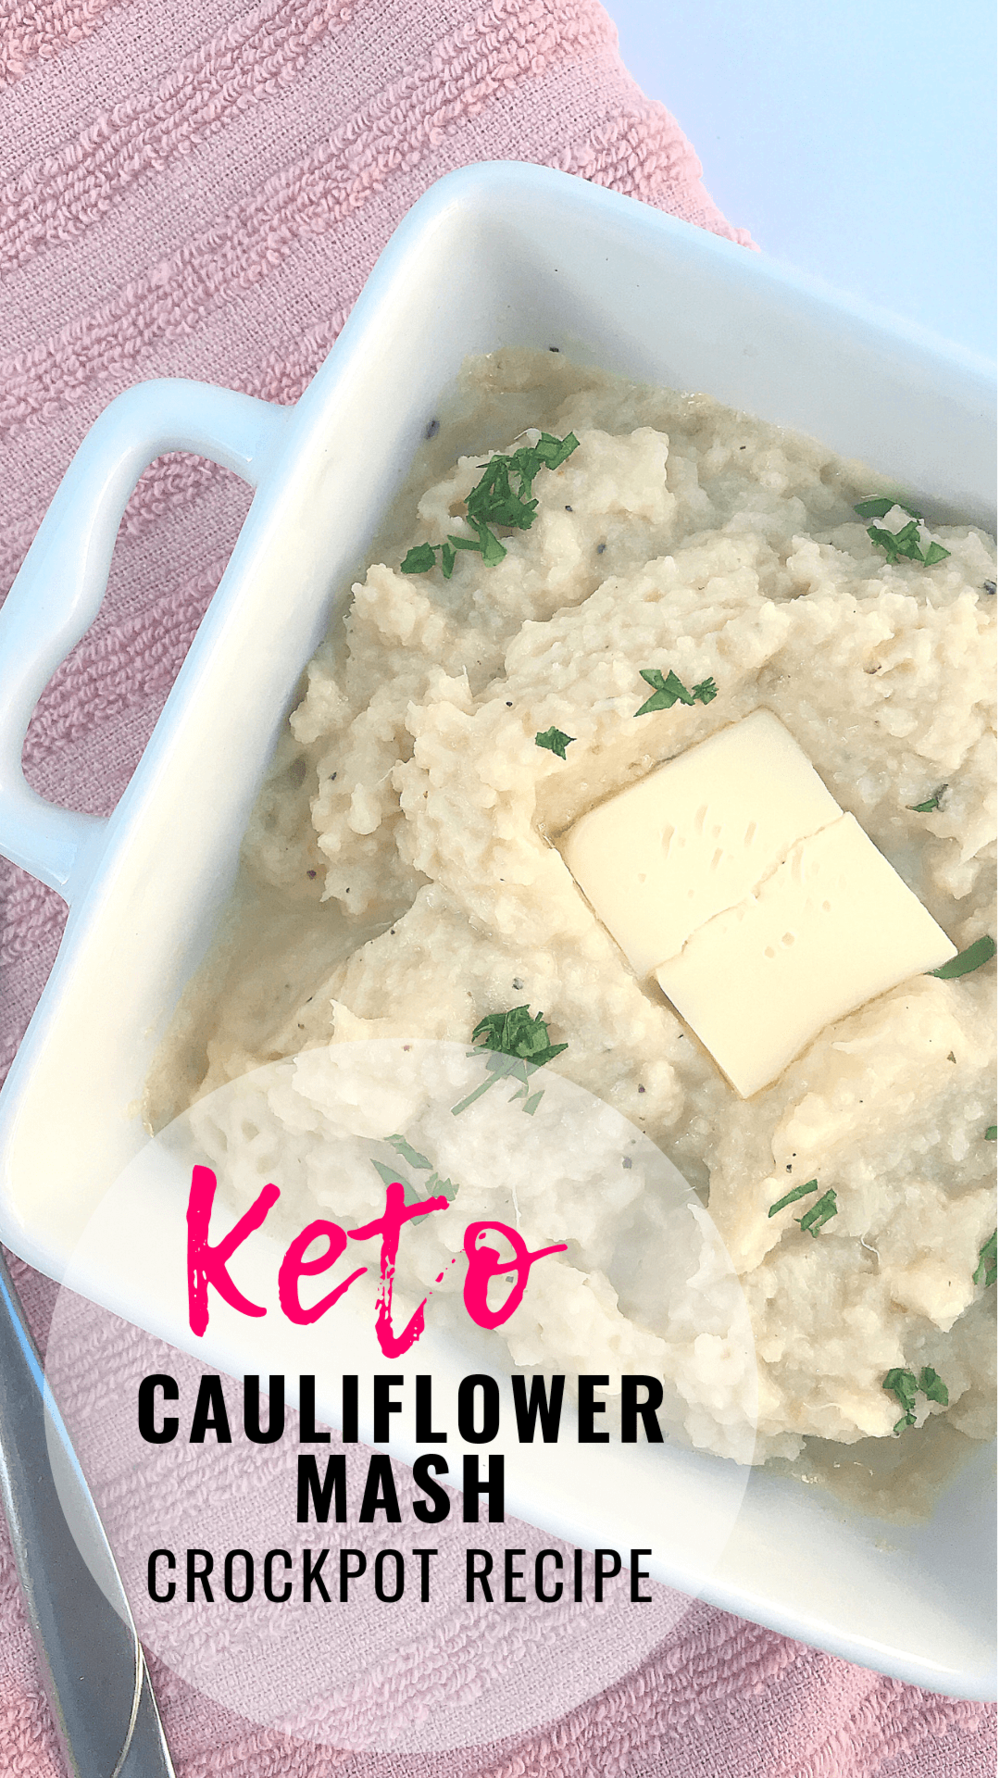 Low Carb Crockpot Garlic Cauliflower Mash Recipe